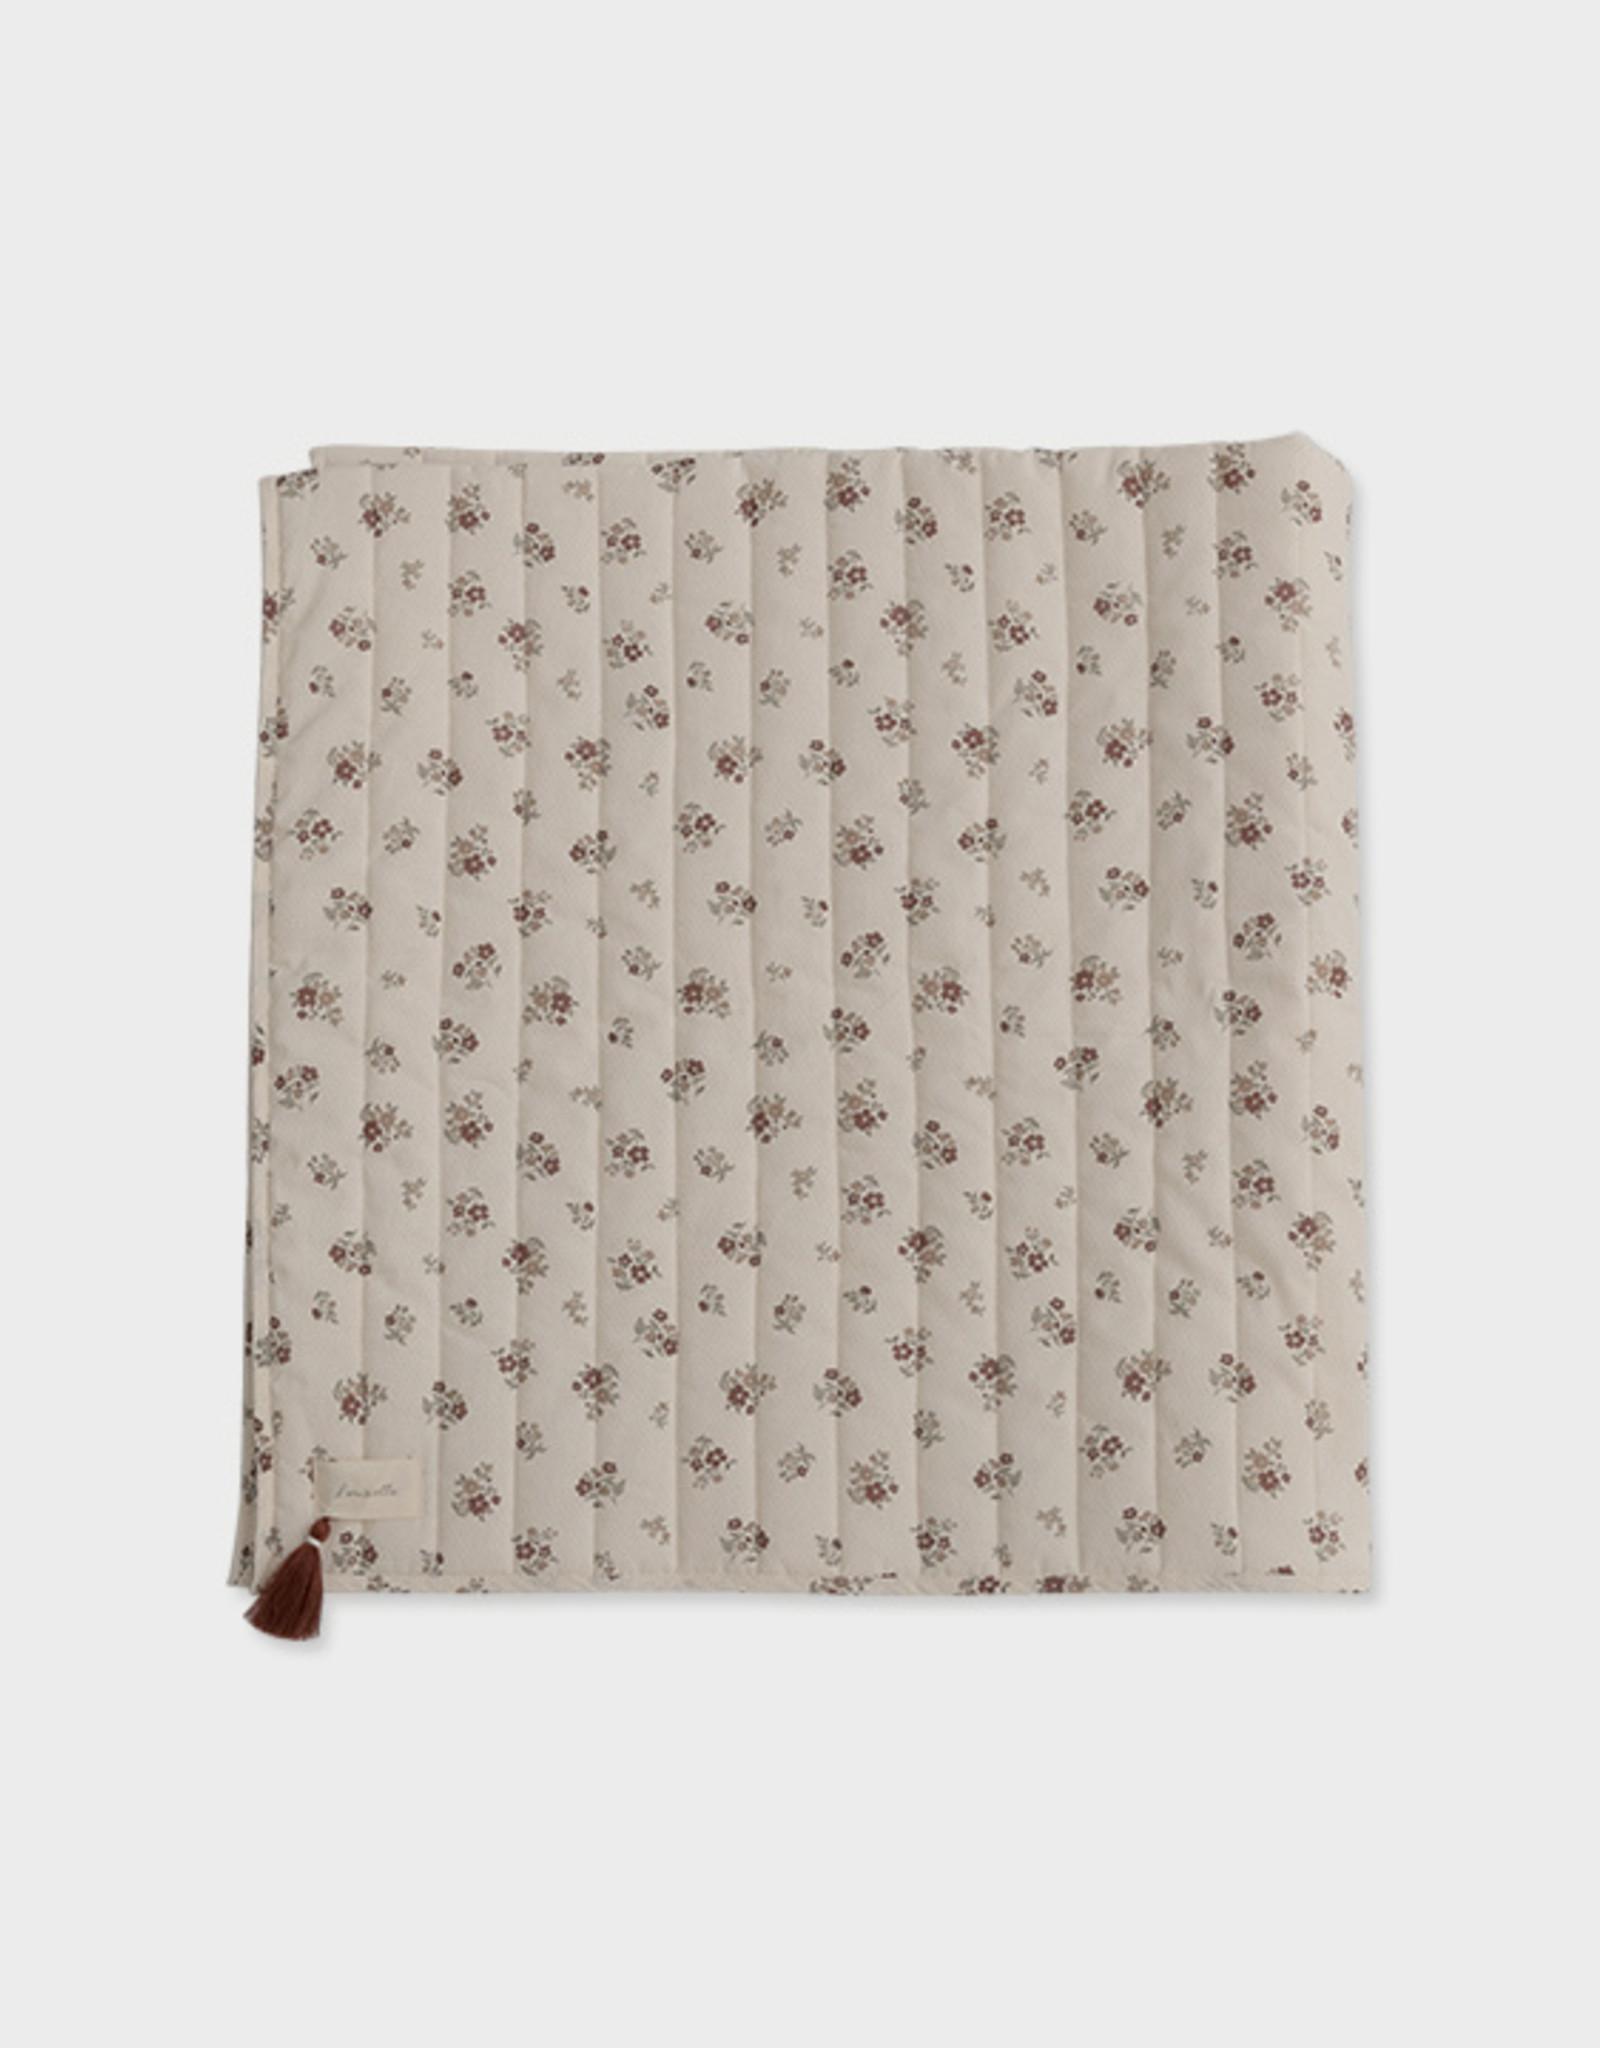 Louisiella L'orge Quilting Blanket